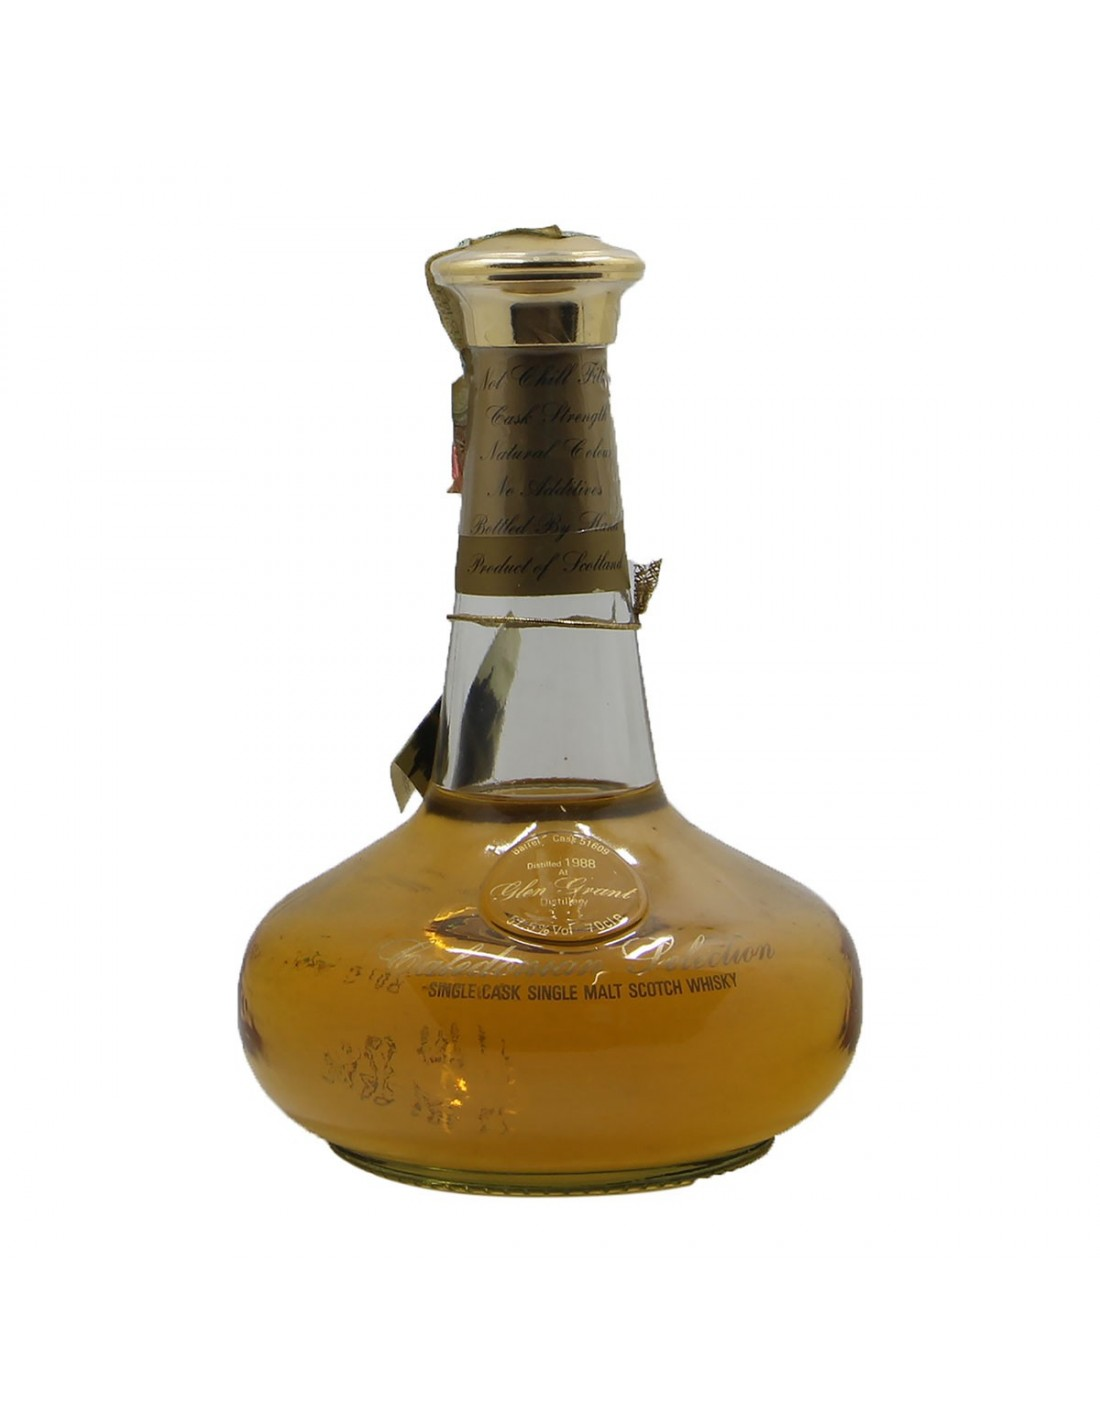 DECANTER CALEDONIAN SELECTION SINGLE CASK SINGLE MALT 1988 GLEN GRANT Grandi Bottiglie